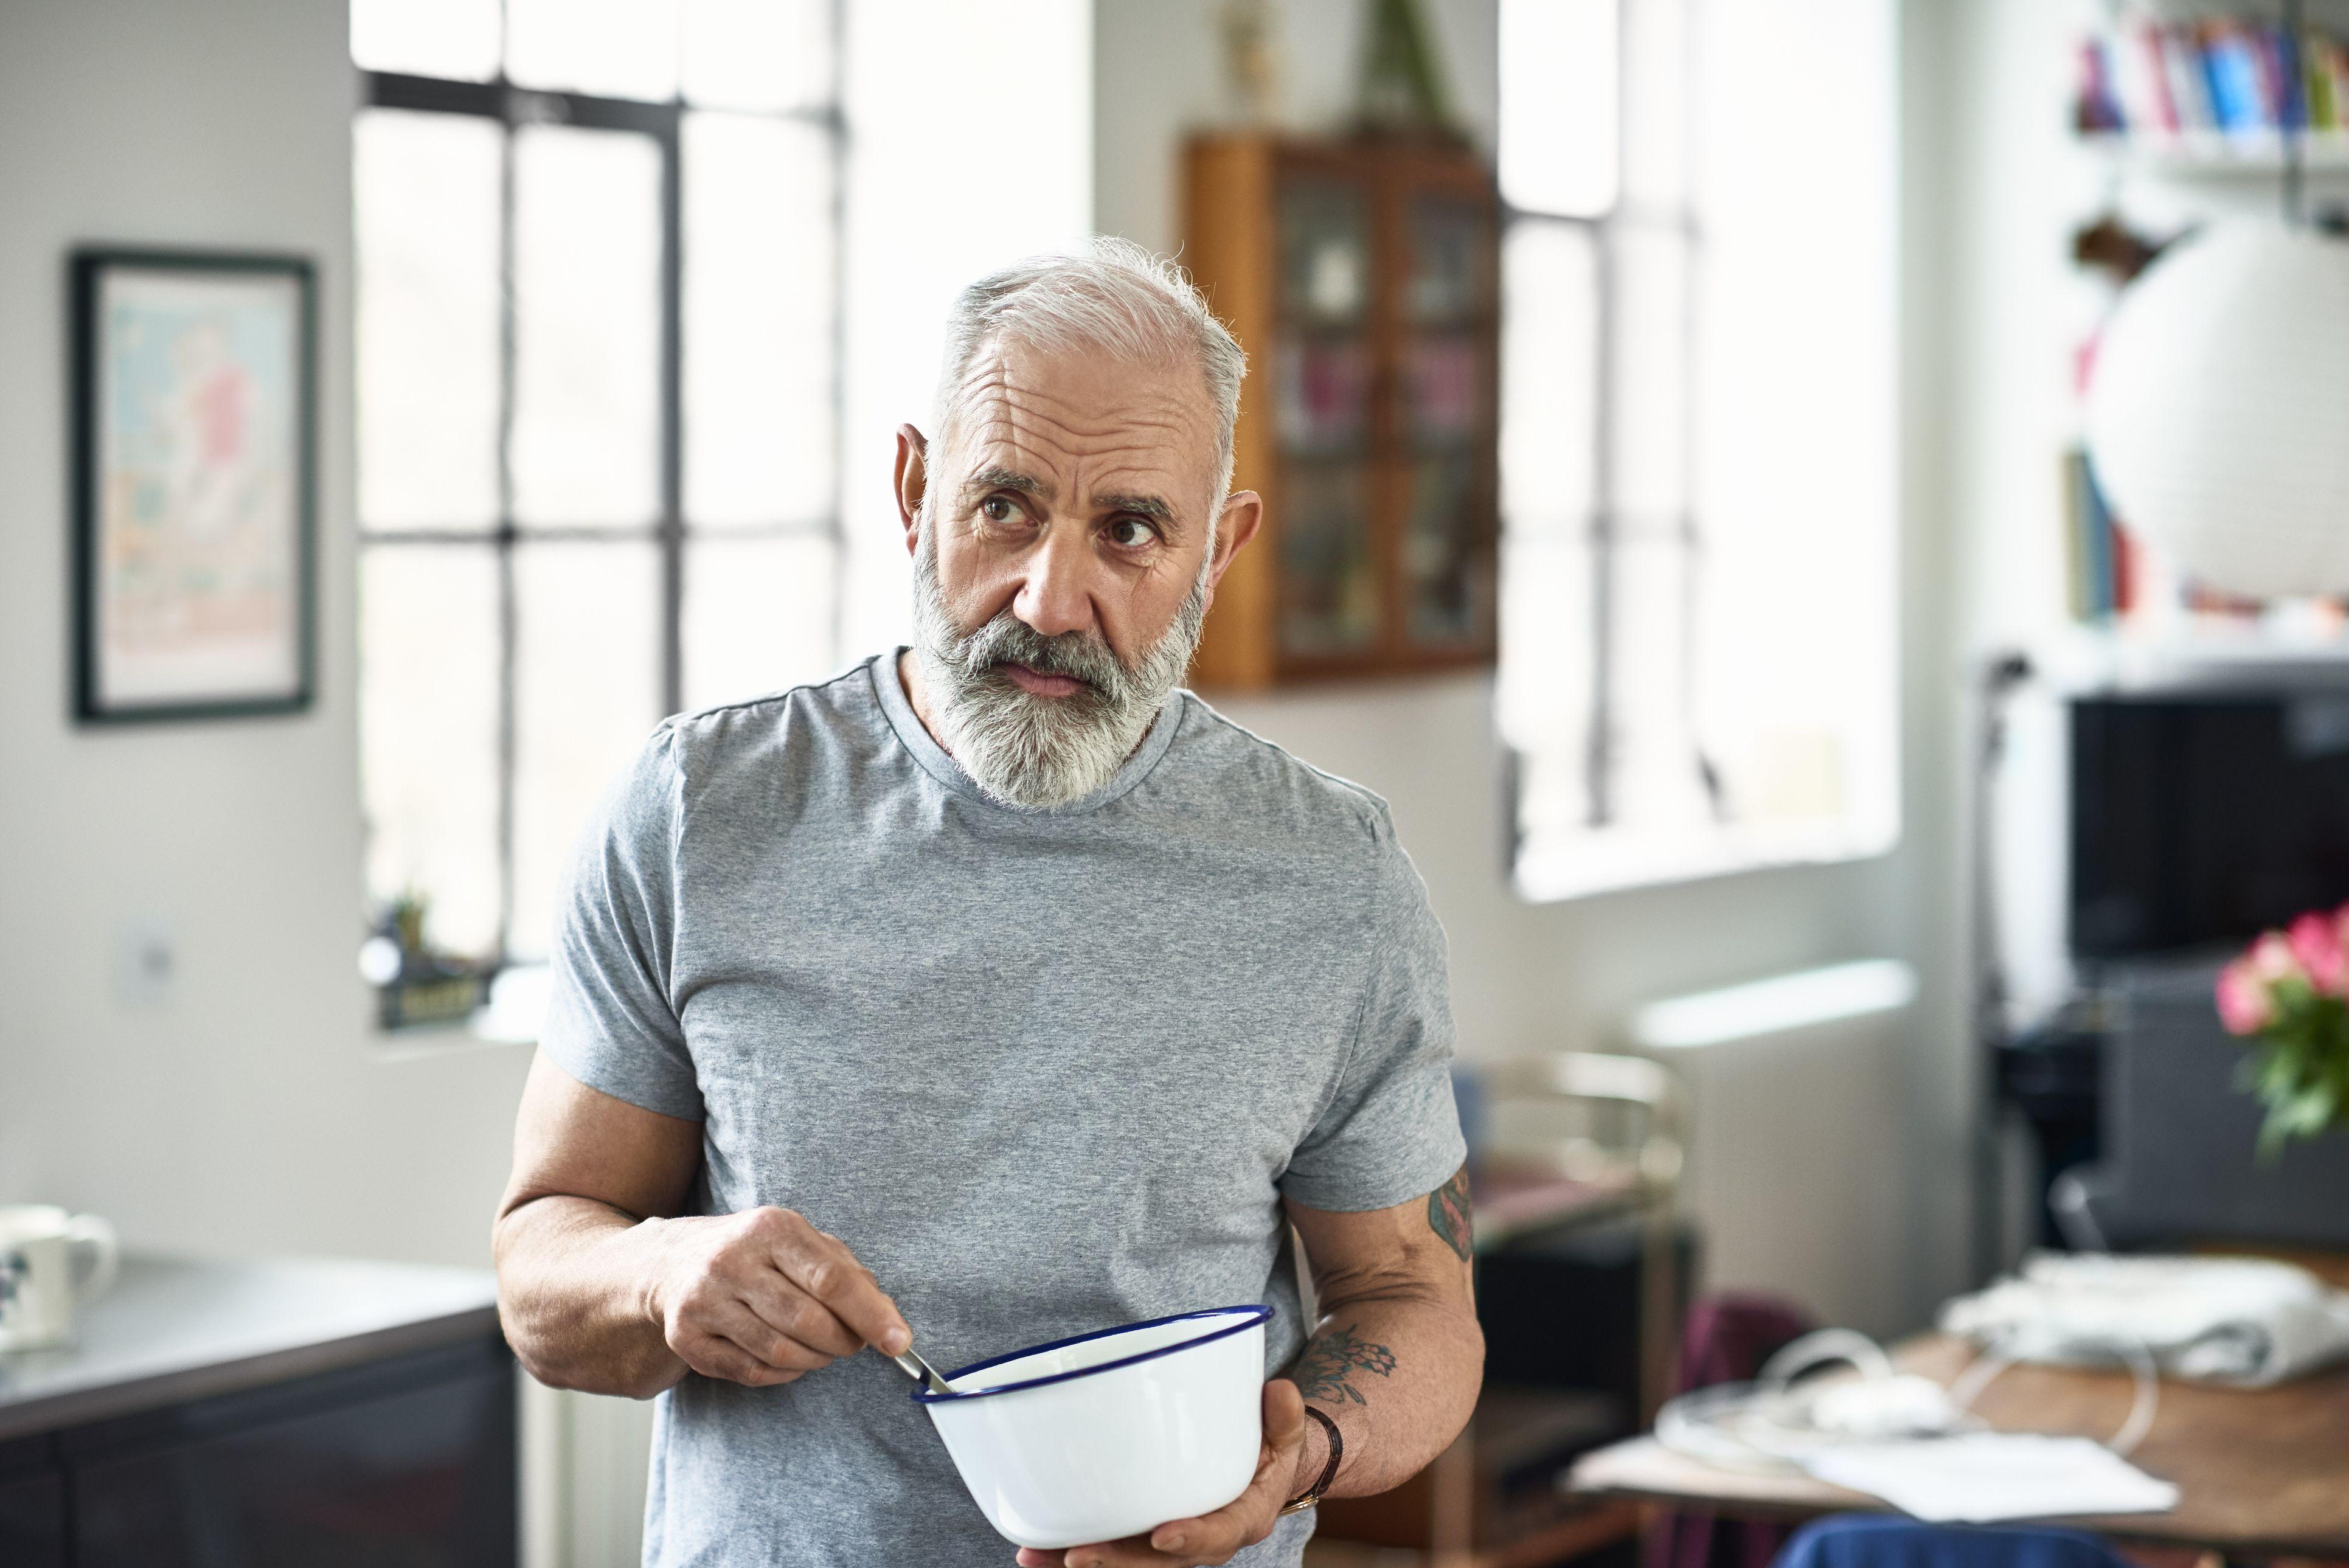 Portrait of senior man holding bowl and preparing food